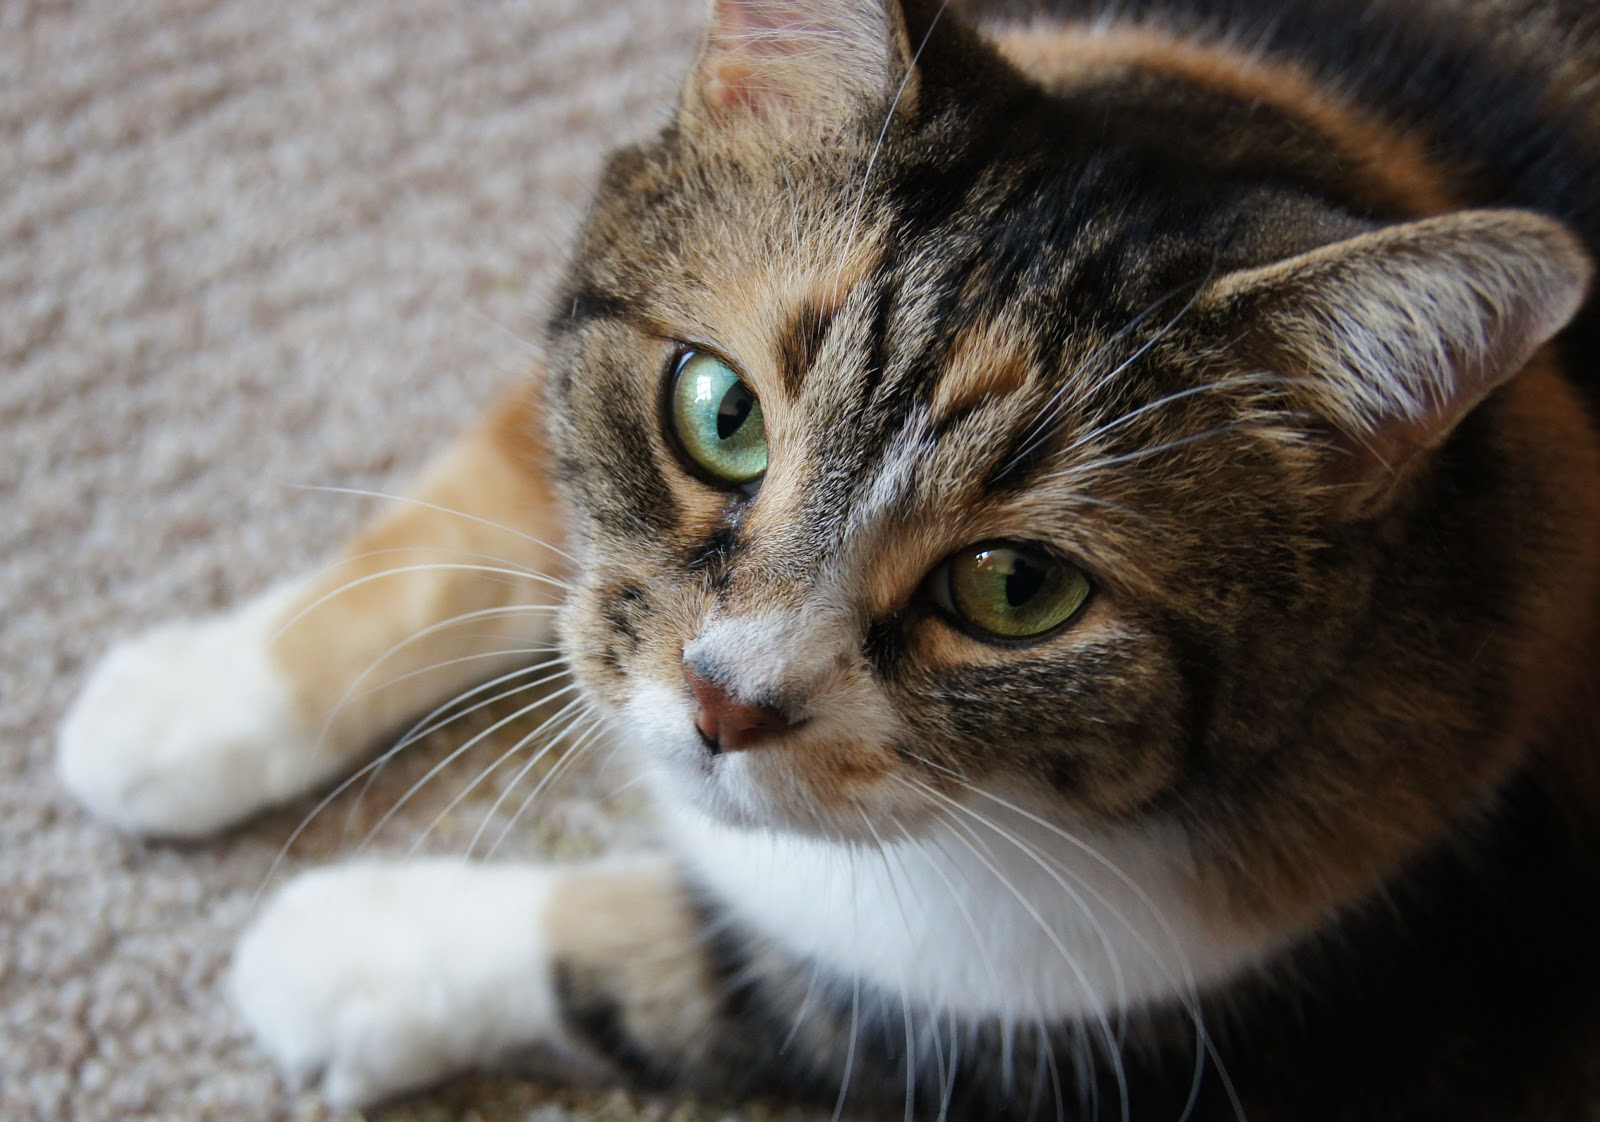 DivaPaws4Advice: Saturday File: COOL CAT TIME = Make Time